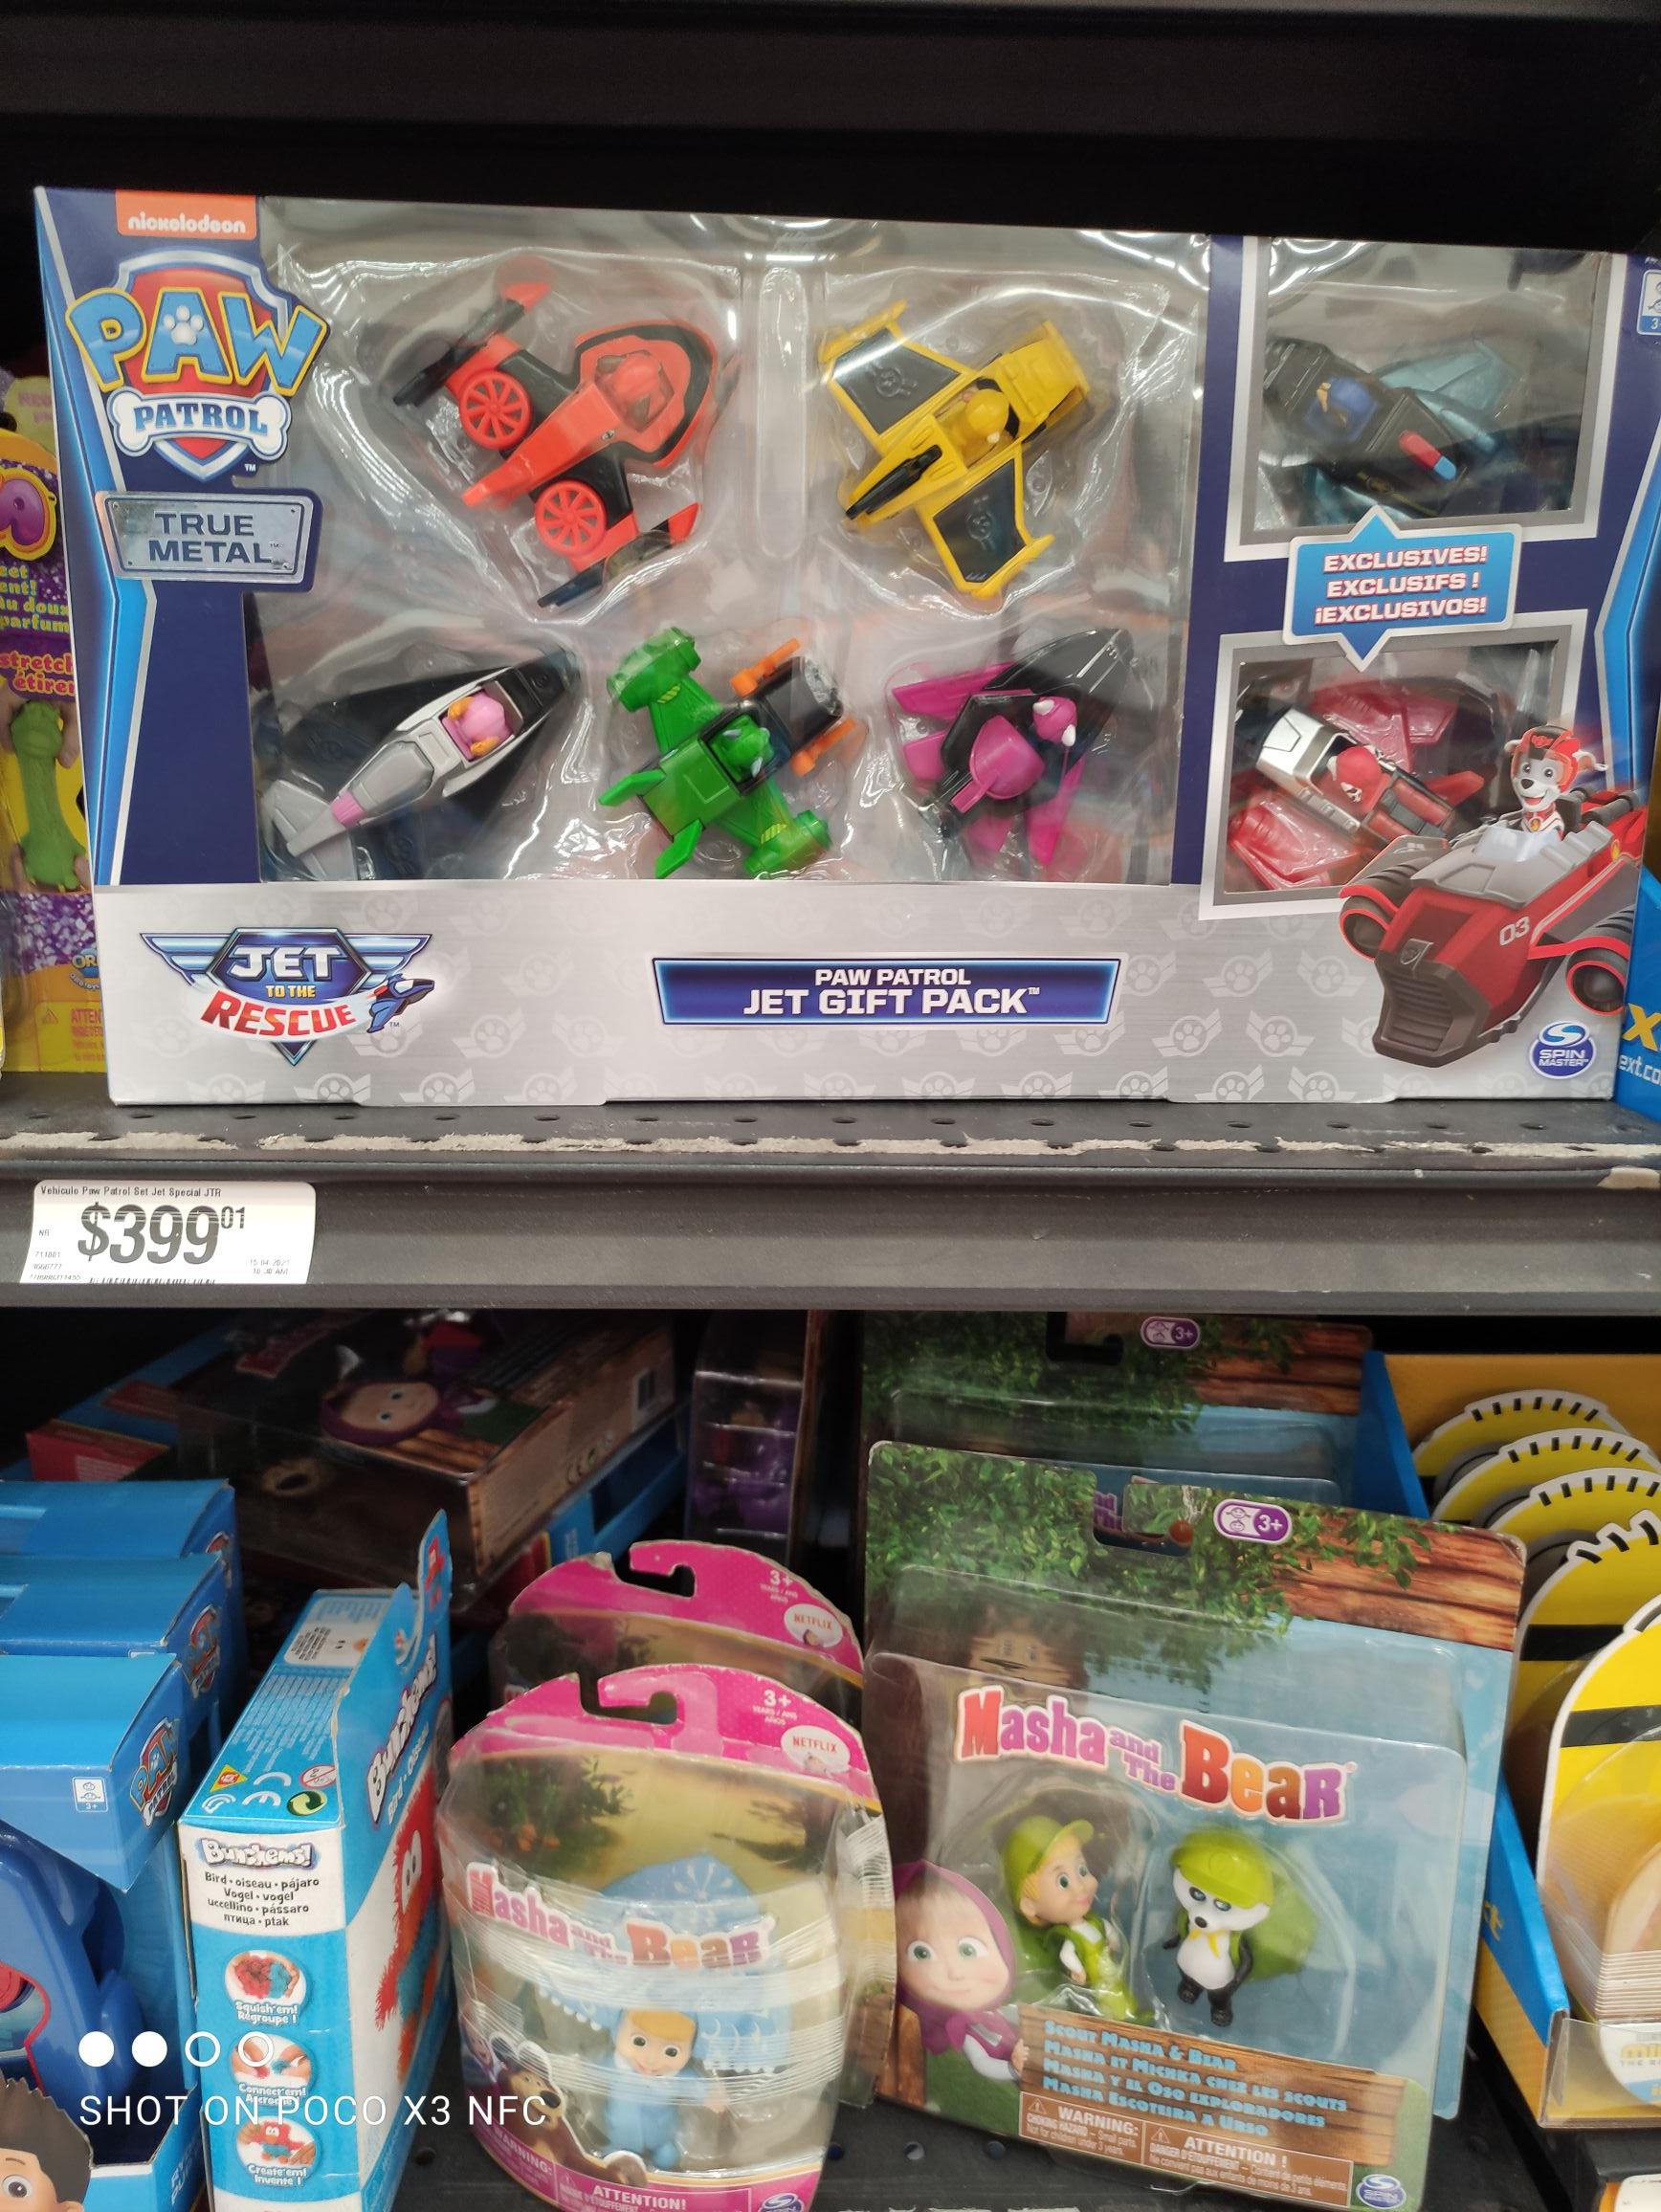 Chedraui: Paw Patrol Jet Gift Pack